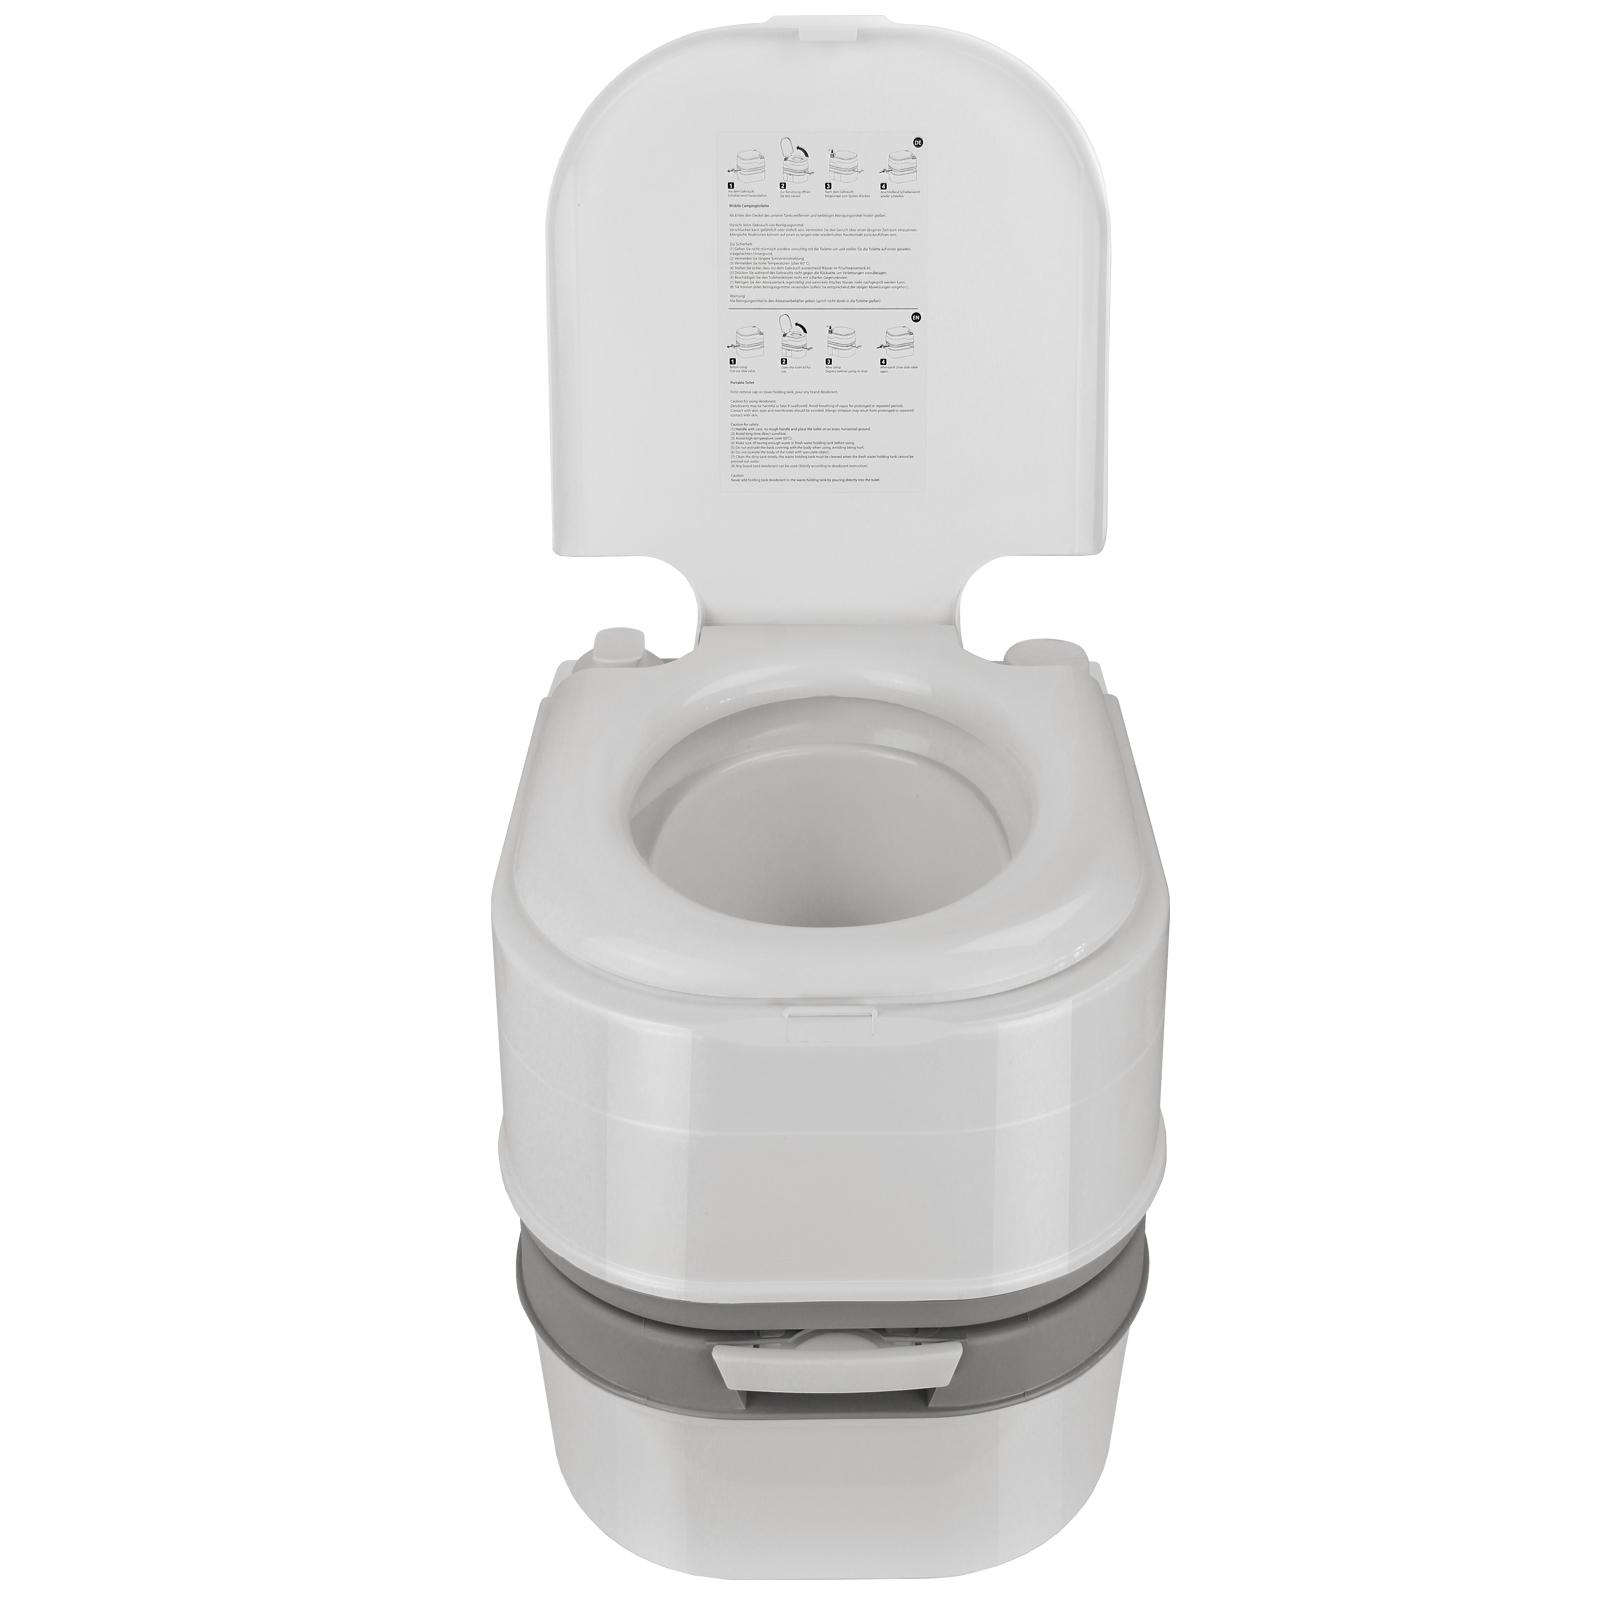 mobile camping toilette mit kolbenpumpe 24 l von bb sport. Black Bedroom Furniture Sets. Home Design Ideas